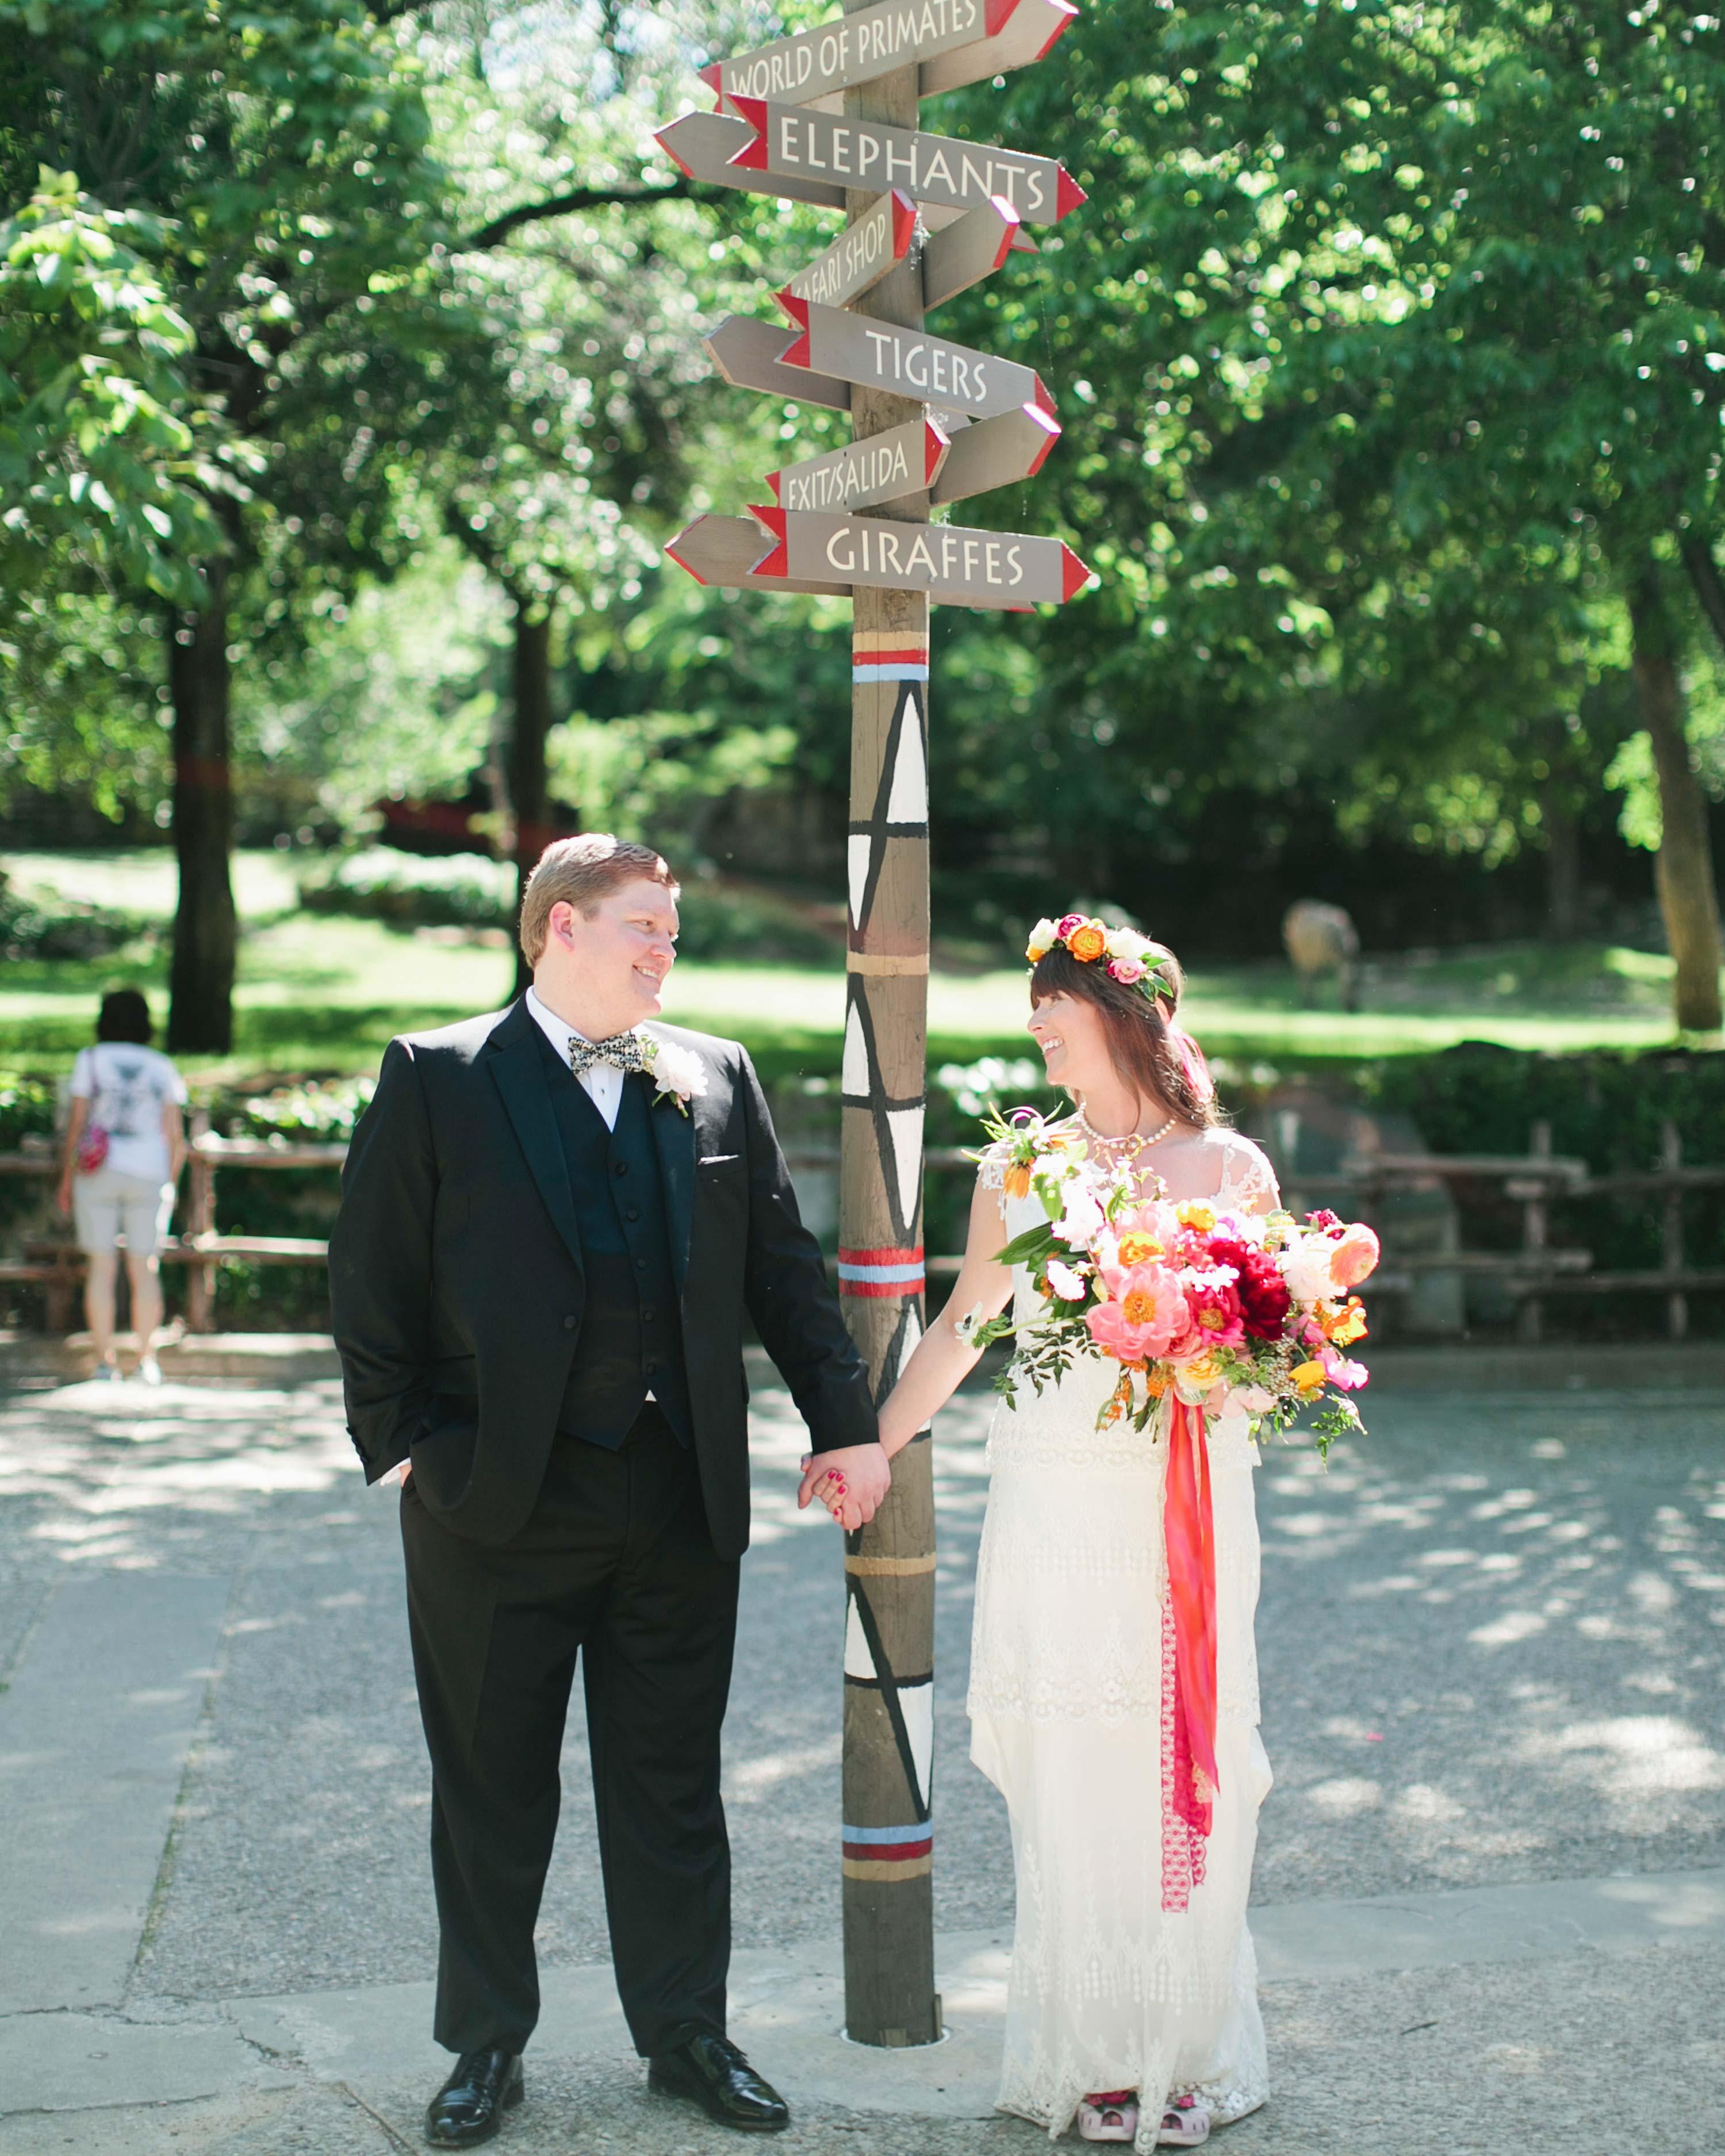 holly-john-wedding-texas-couple-zoo-042-s112833-0516.jpg